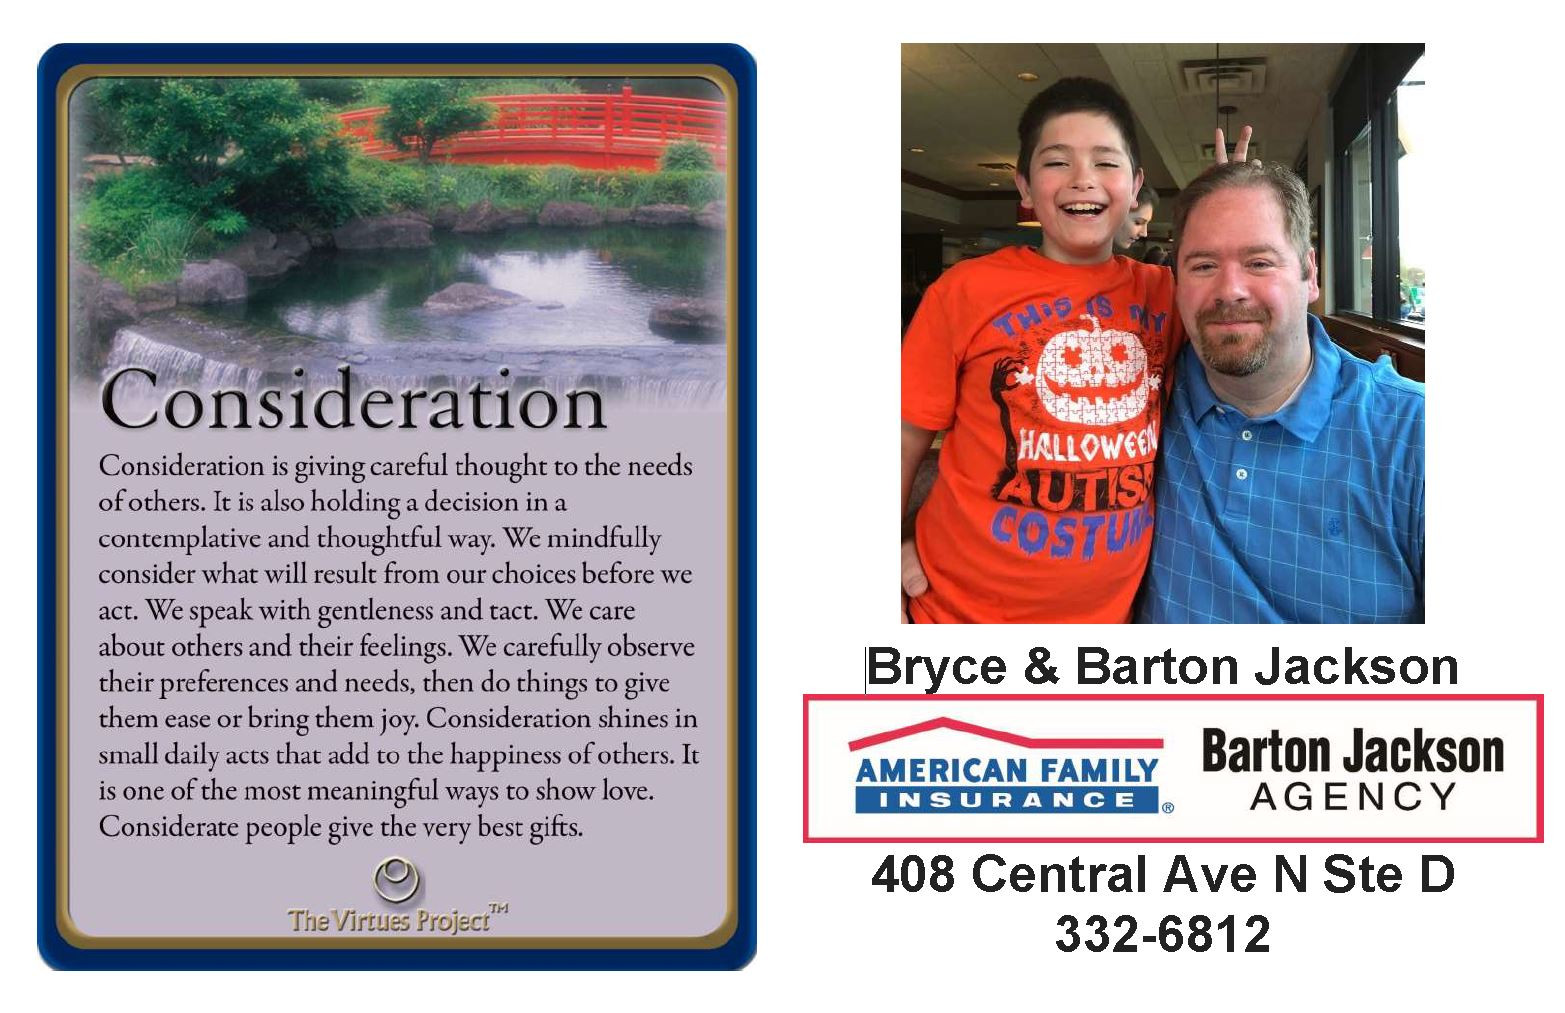 American Family Consideration.JPG